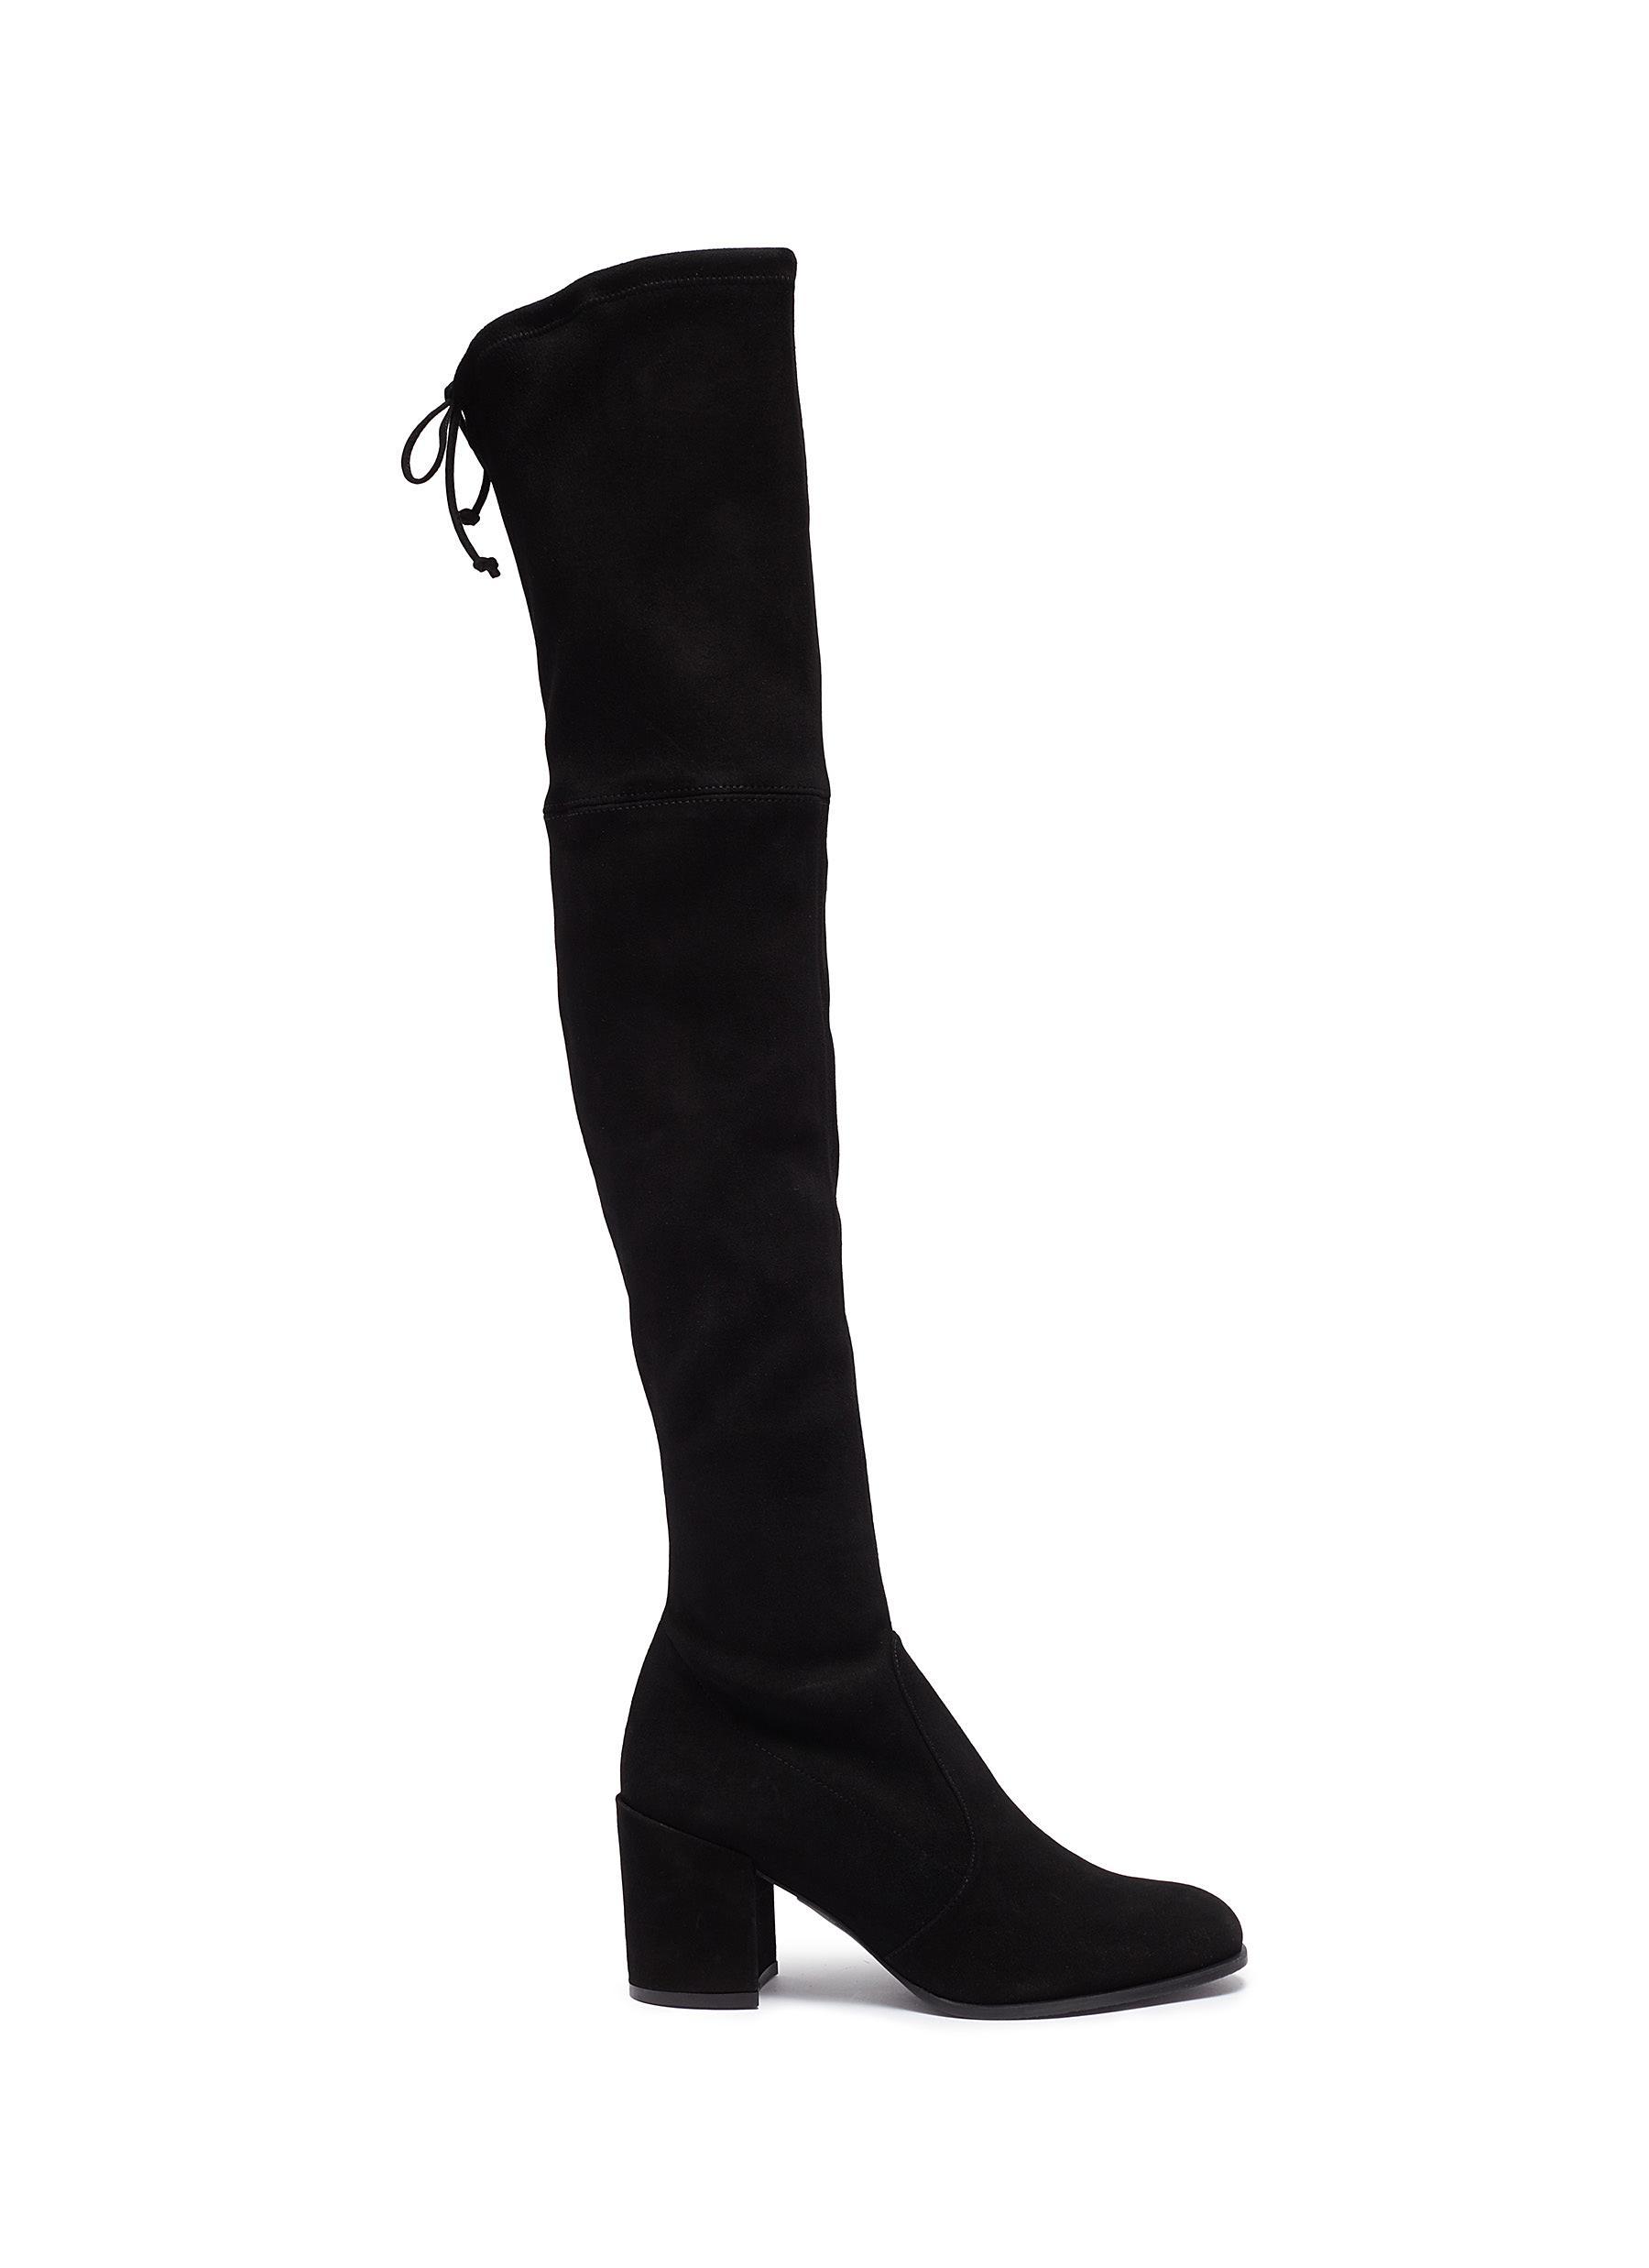 Stuart Weitzman Boots Tieland stretch suede thigh high boots